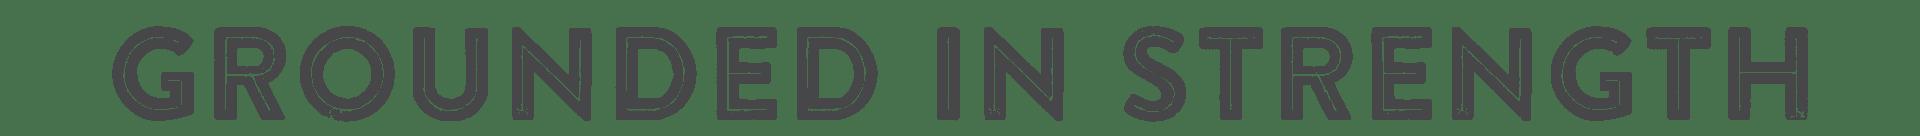 logo - text